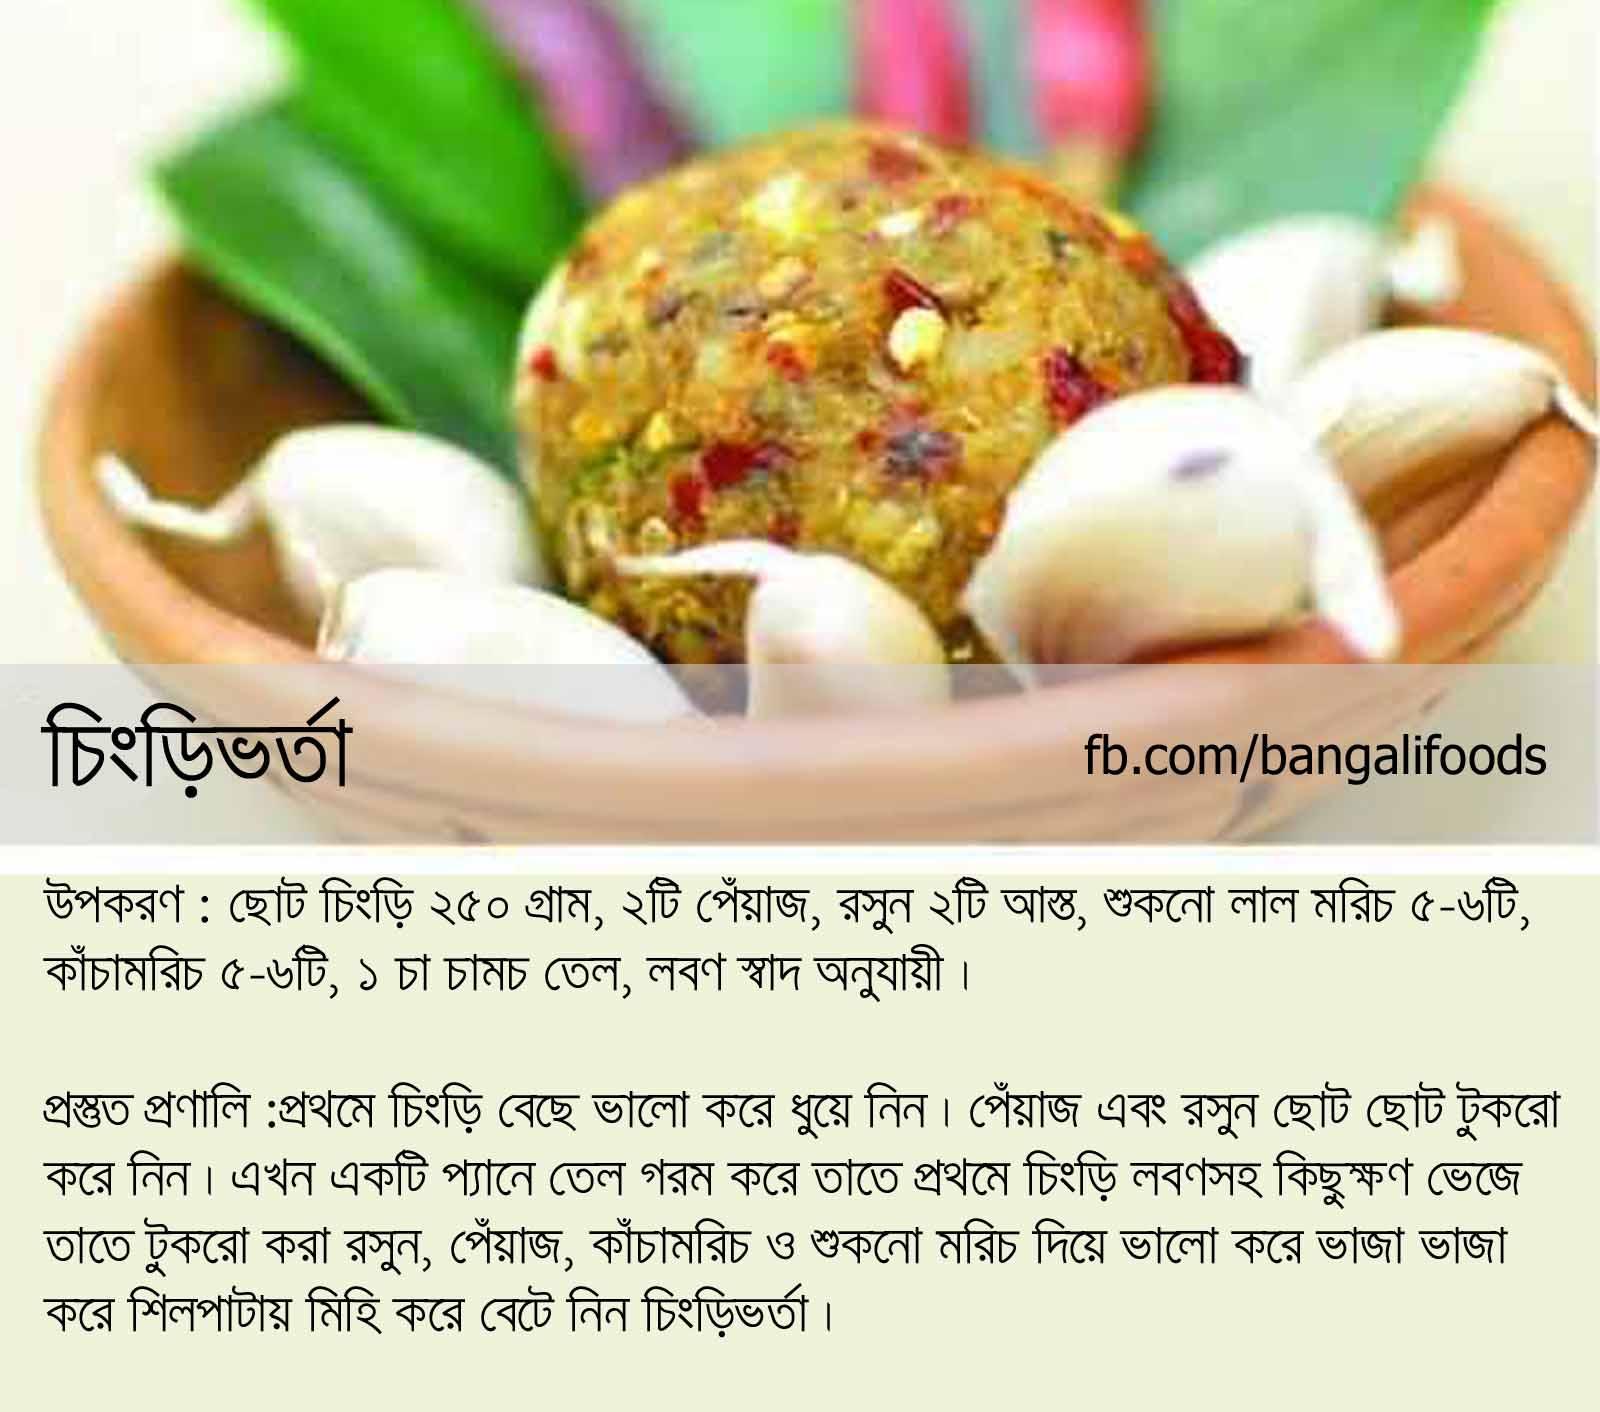 Bangali foods yummy bhorta recipes in bengali bengali style chingri prawn bhorta forumfinder Image collections